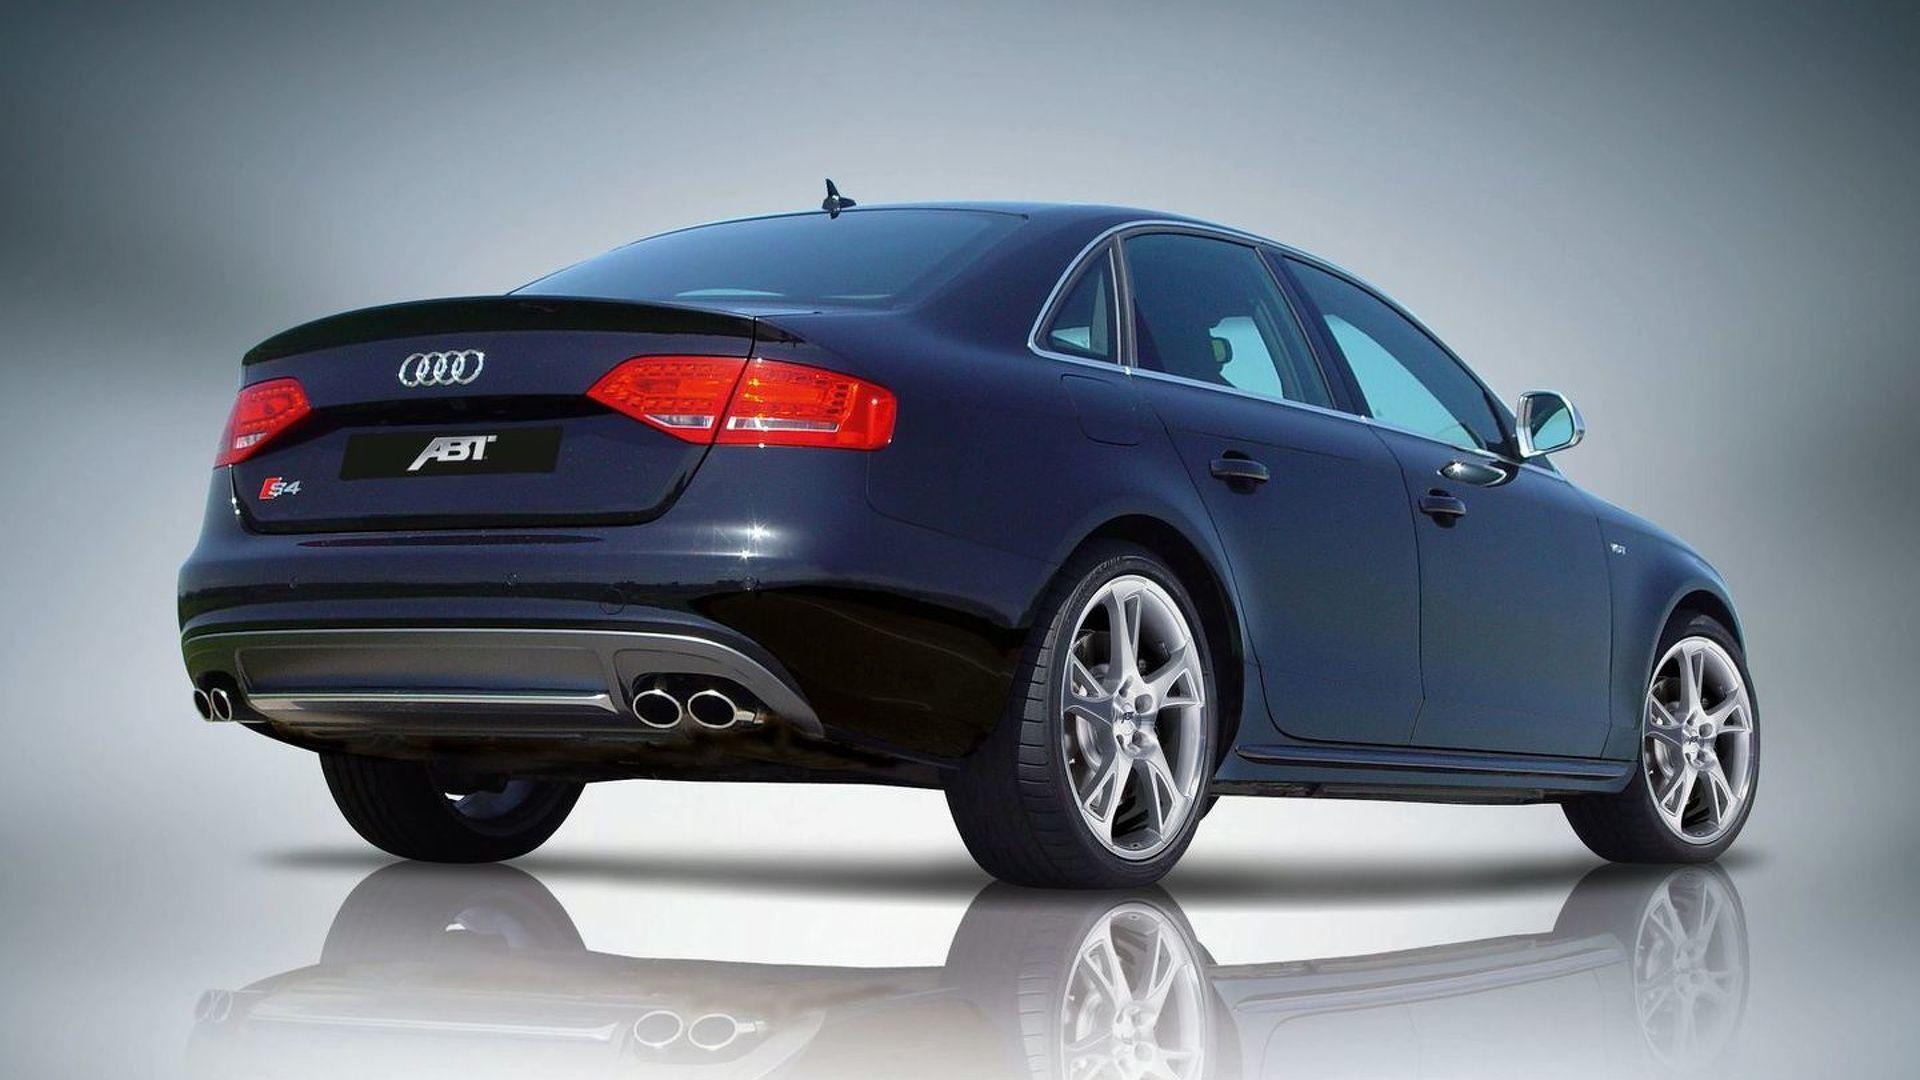 Kekurangan Audi S4 2009 Harga